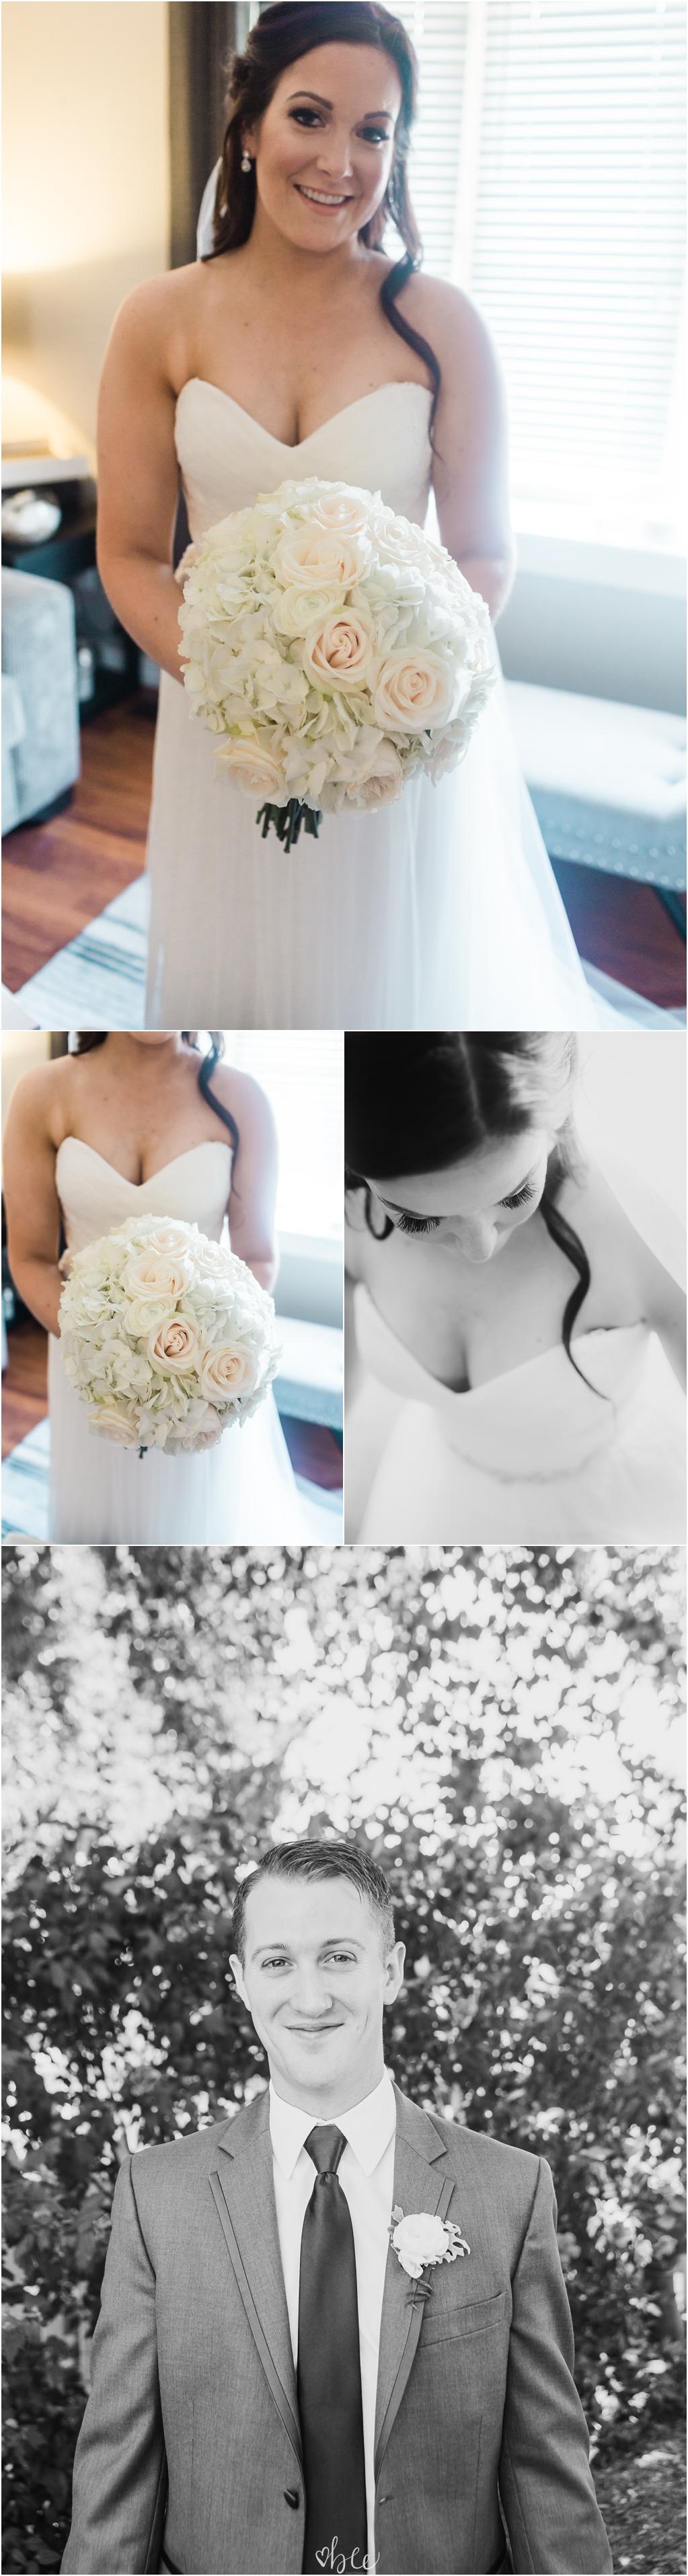 St. Thomas Wedding Photography (44 of 749).jpg